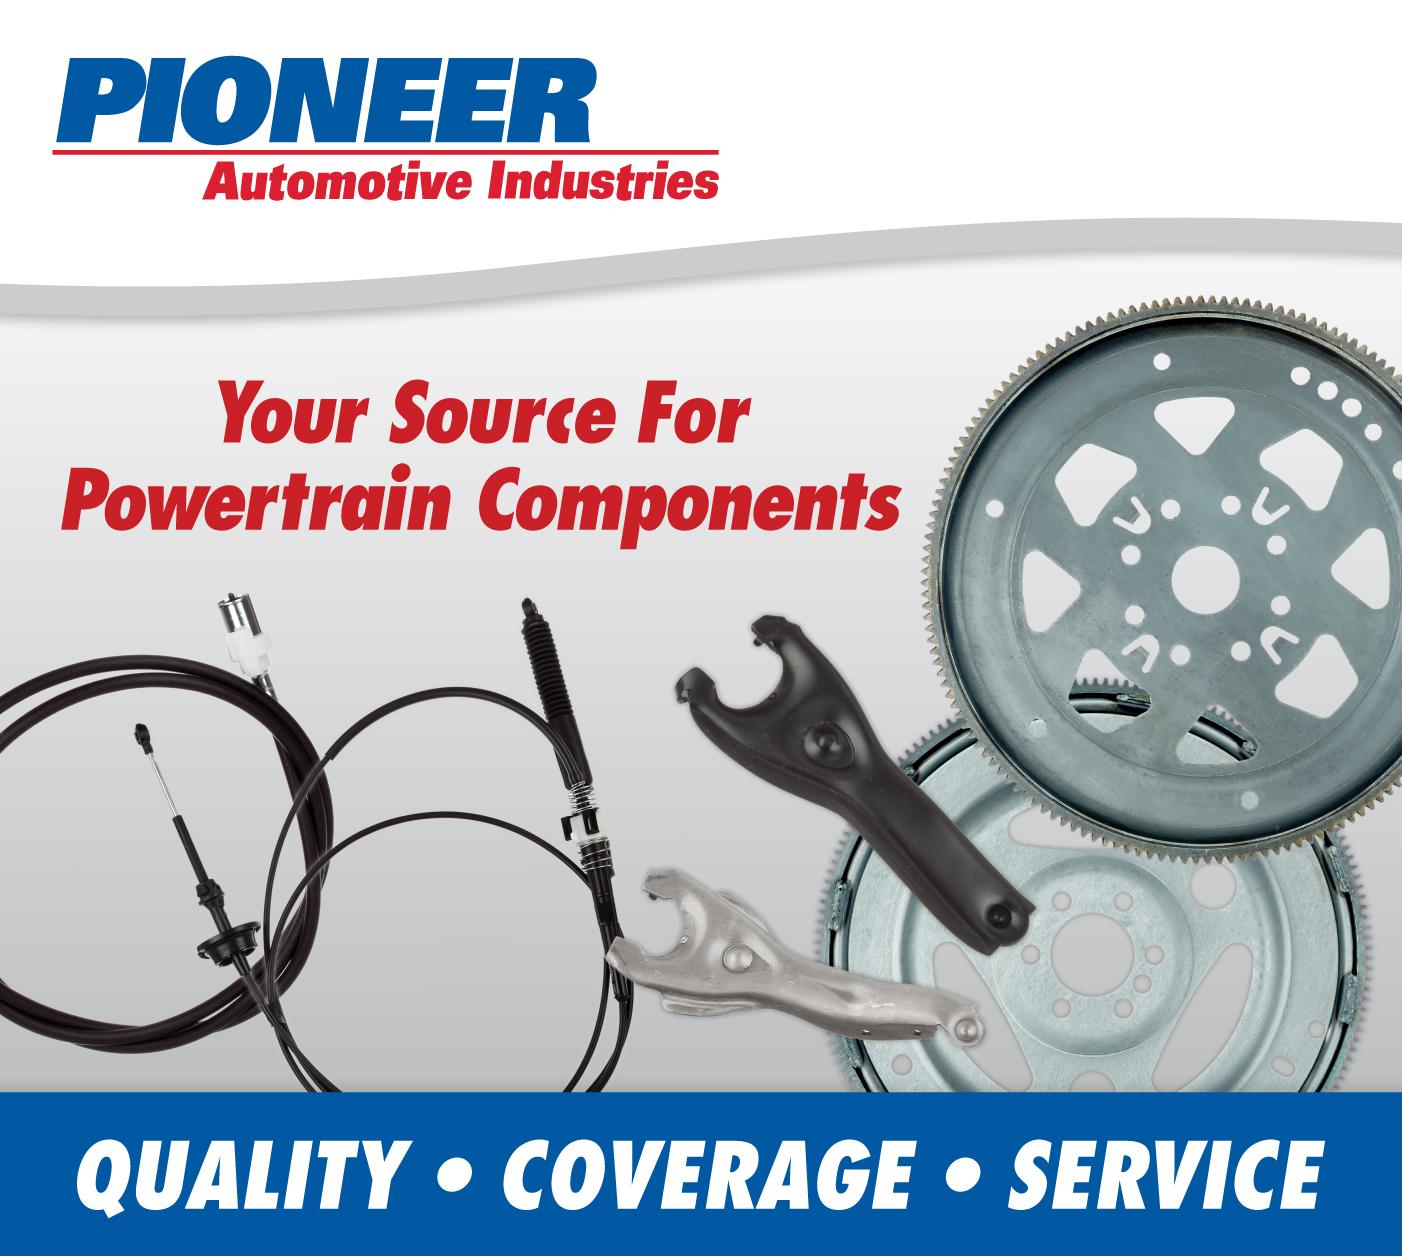 Pioneer 38170-12 Auto Part